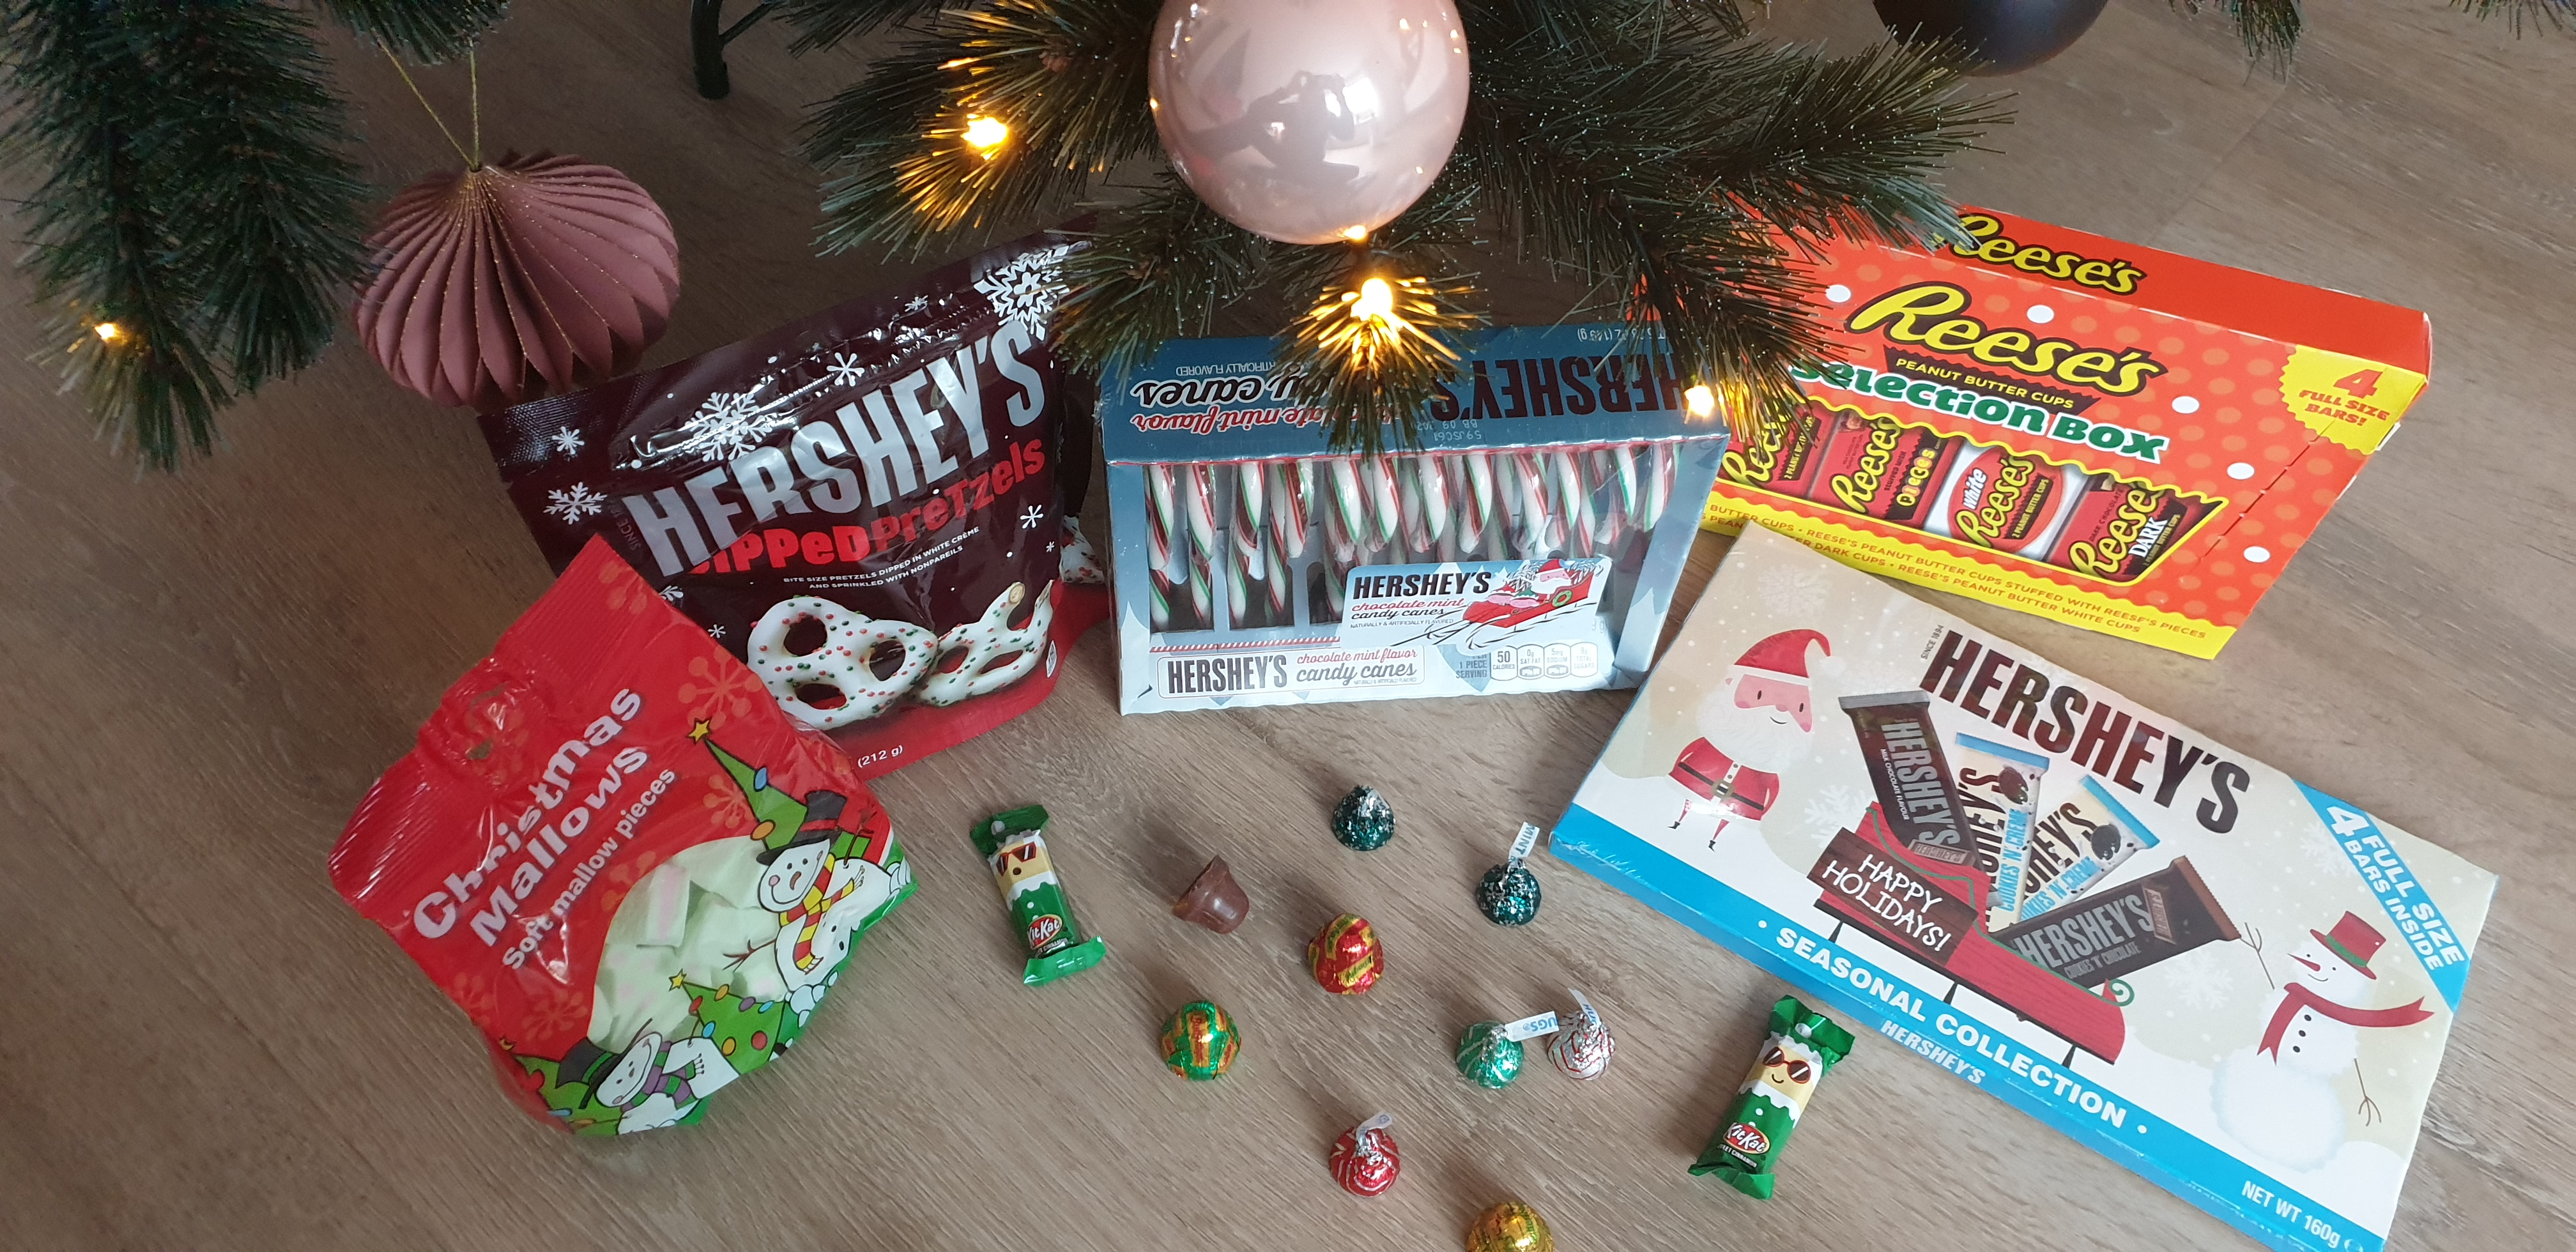 Amerikaans kerstsnoep kopen